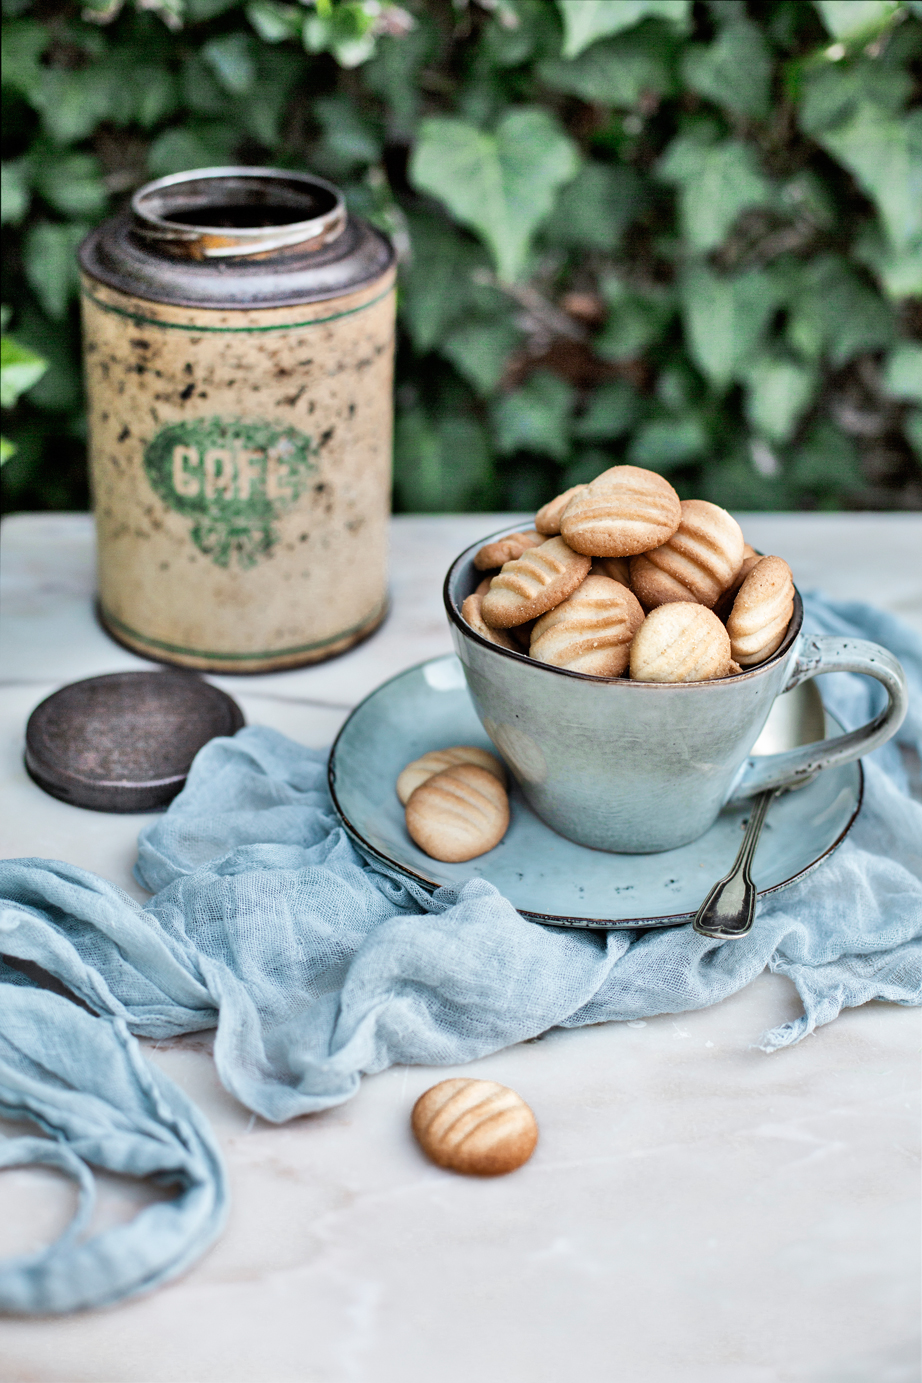 https://conto.pt/wp-content/uploads/2019/05/biscoitos1-1.jpg